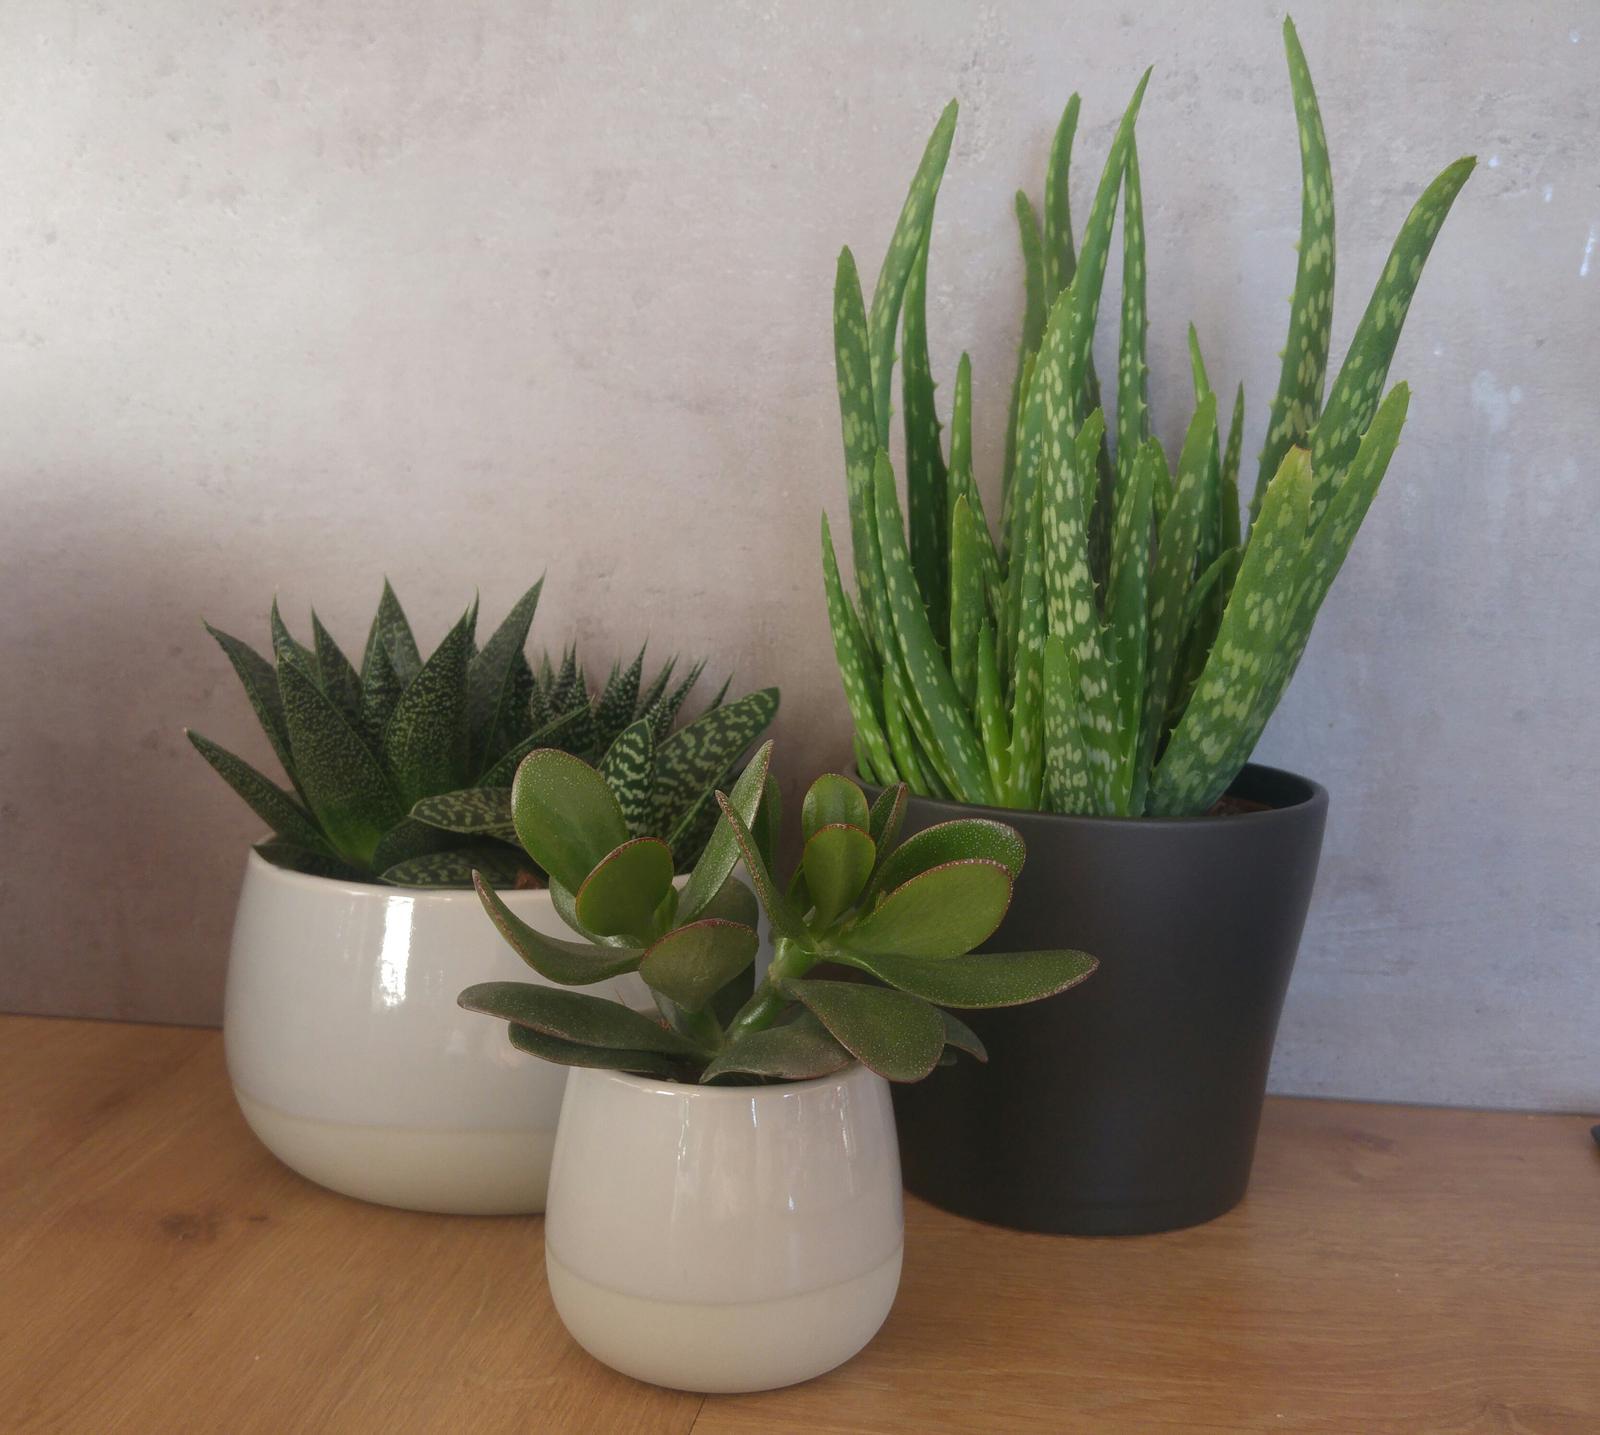 Moje krásne kvetinky - Moje sukulenty z Ikea - aloe aristata, variegata, gasteria, aloe vera, tucnolist (10/2017)